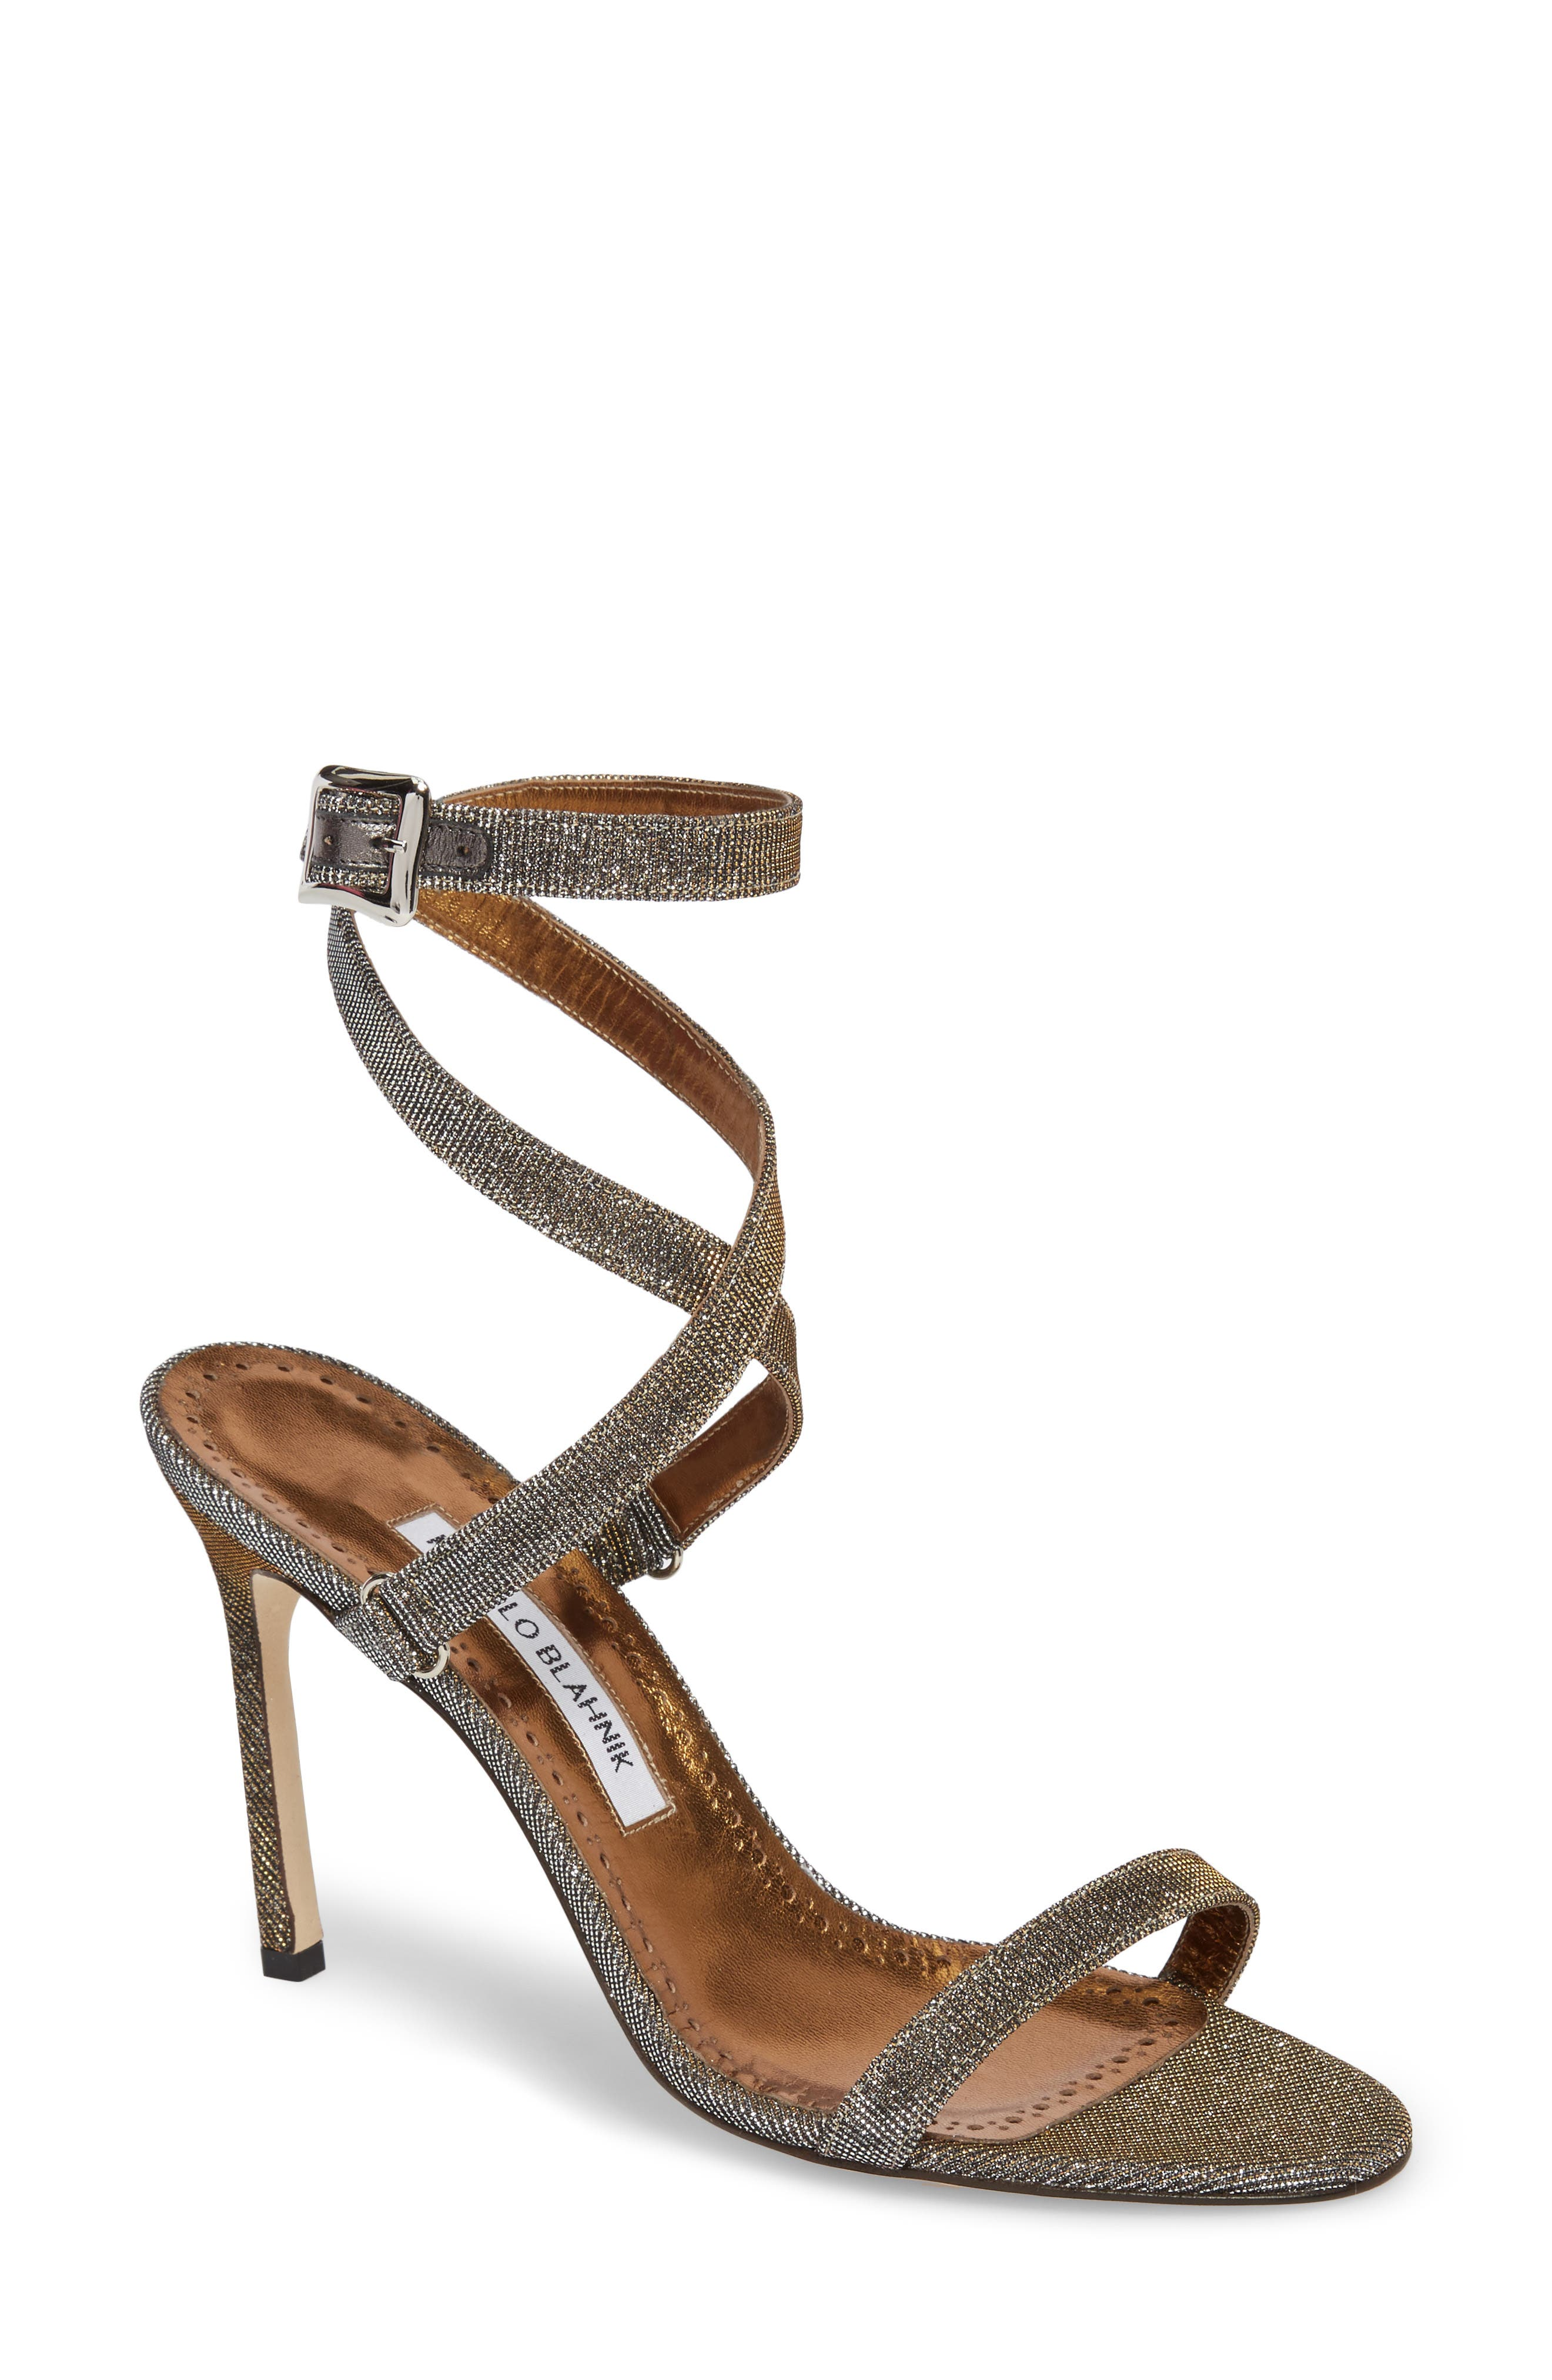 Newfi Ankle Strap Sandal,                             Main thumbnail 1, color,                             041